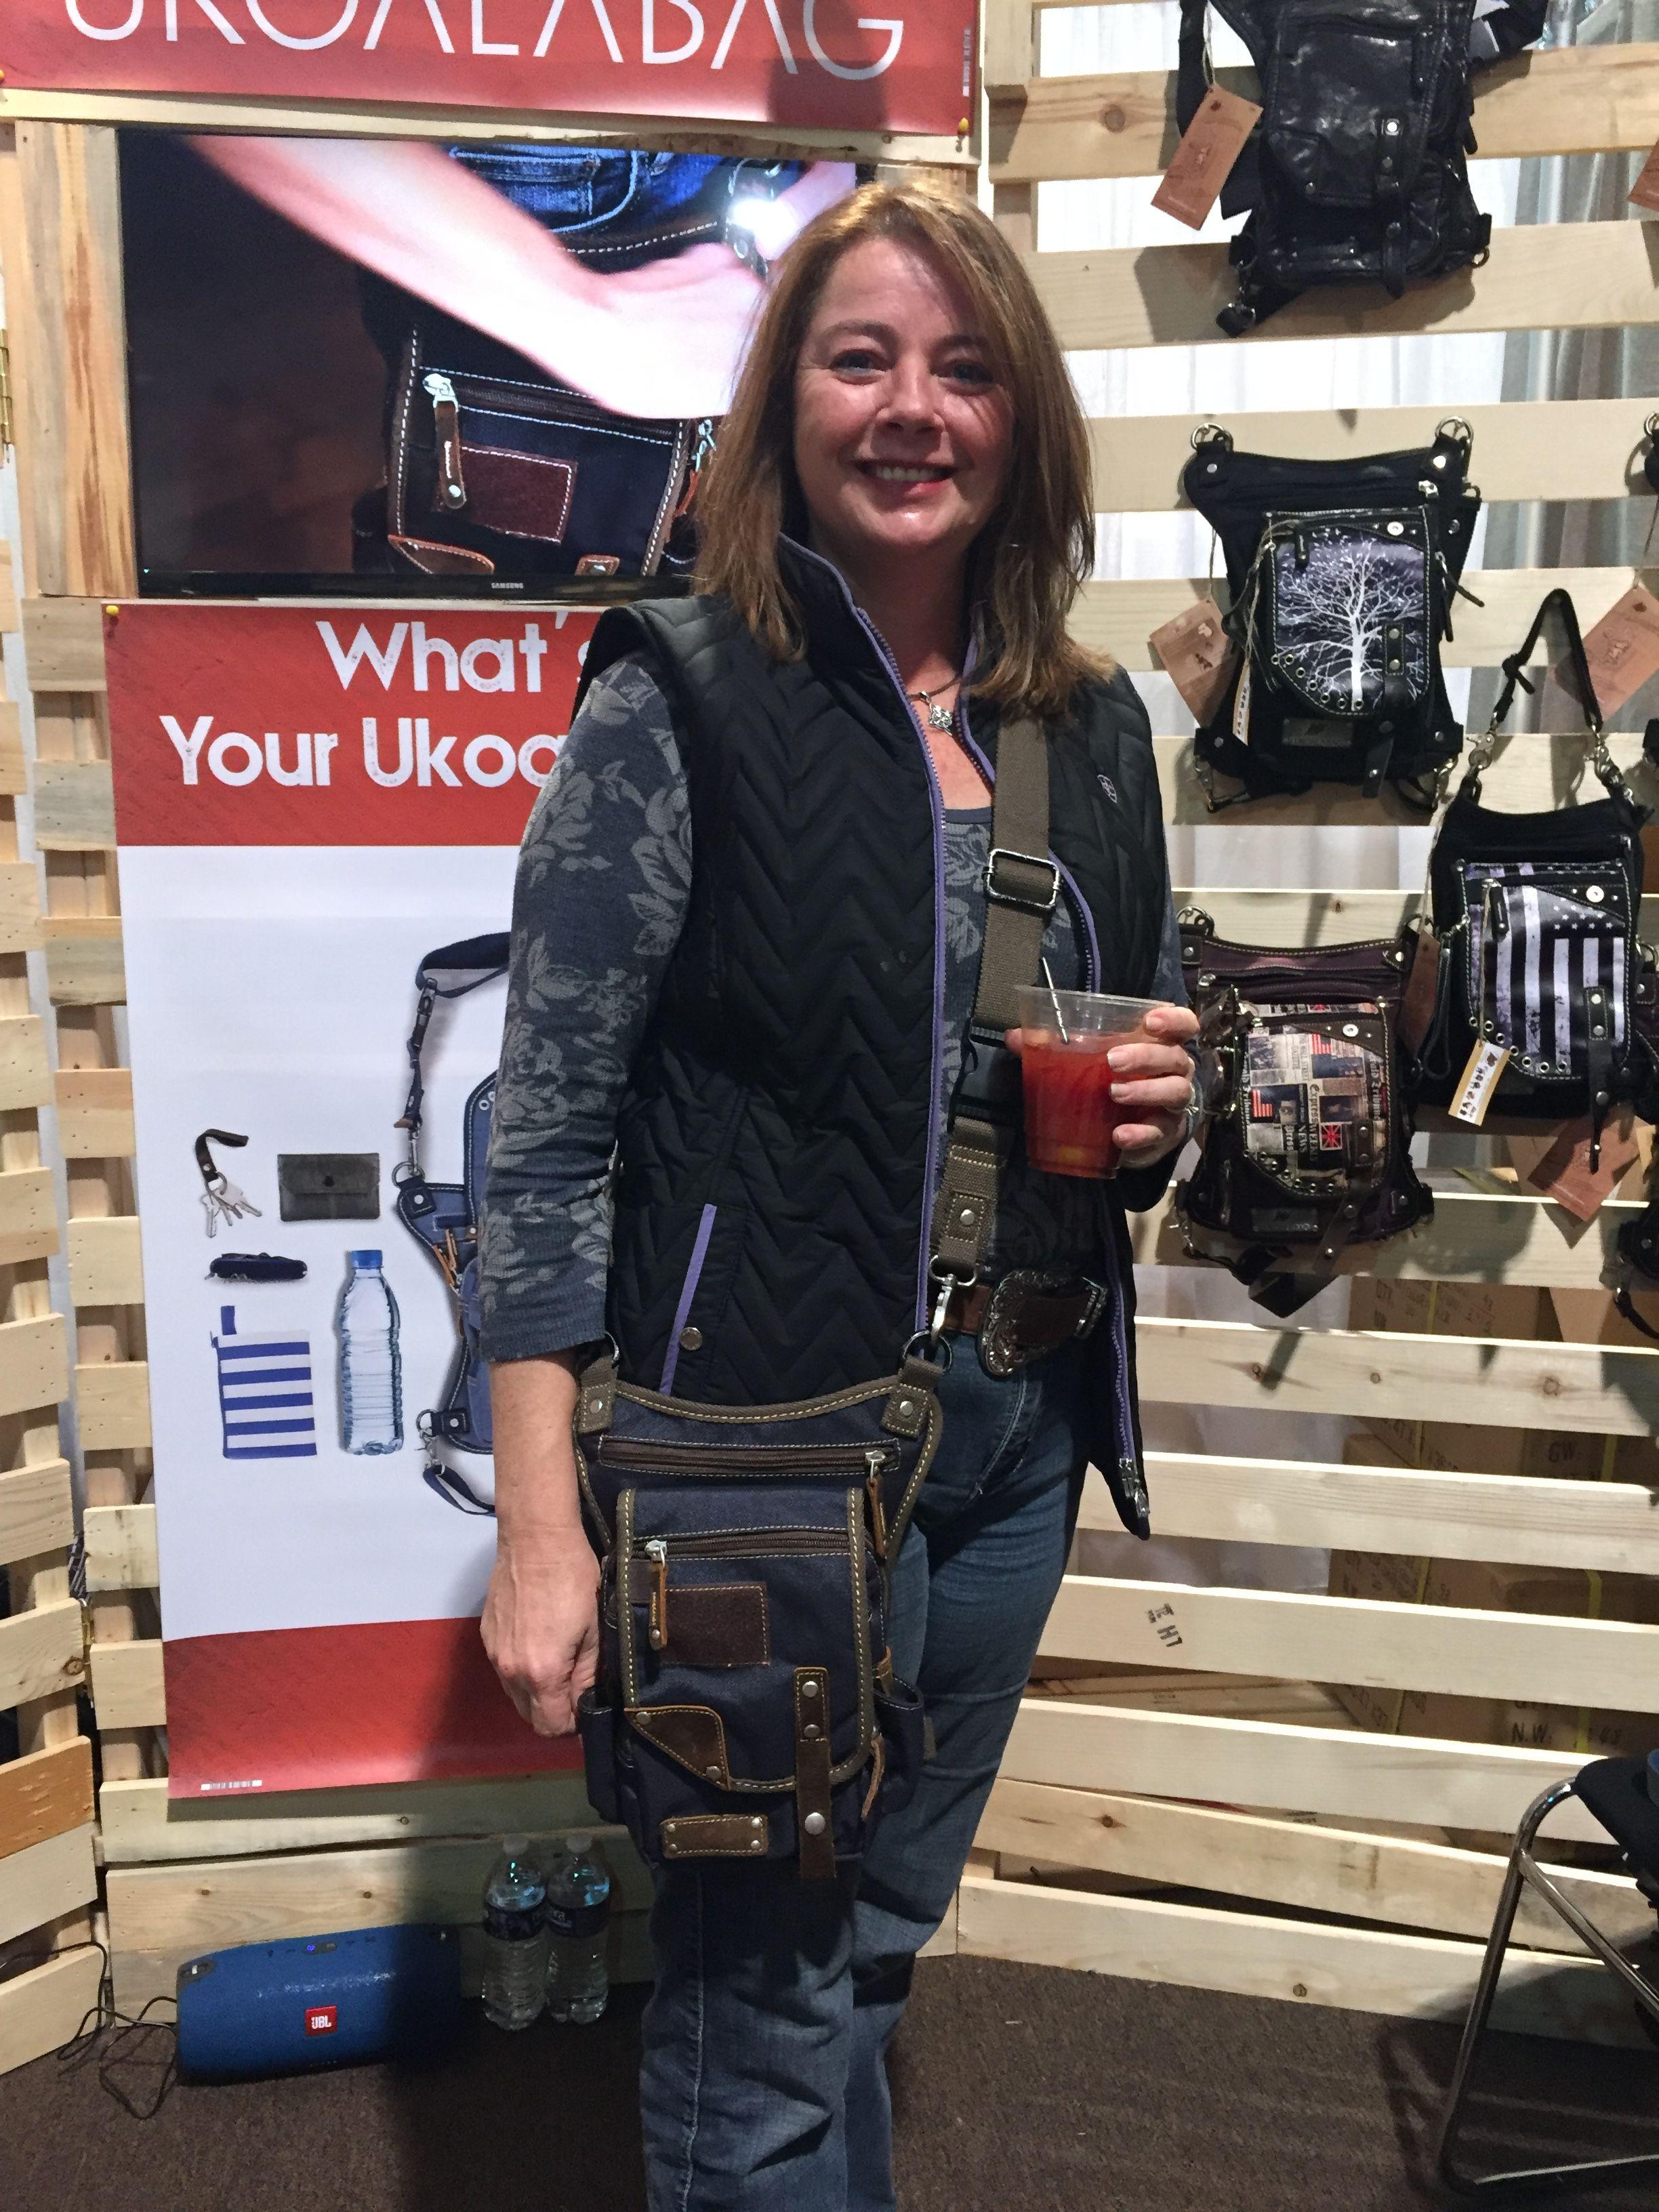 Pin by UUB Urban Utility Bags on Cowboy Christmas show